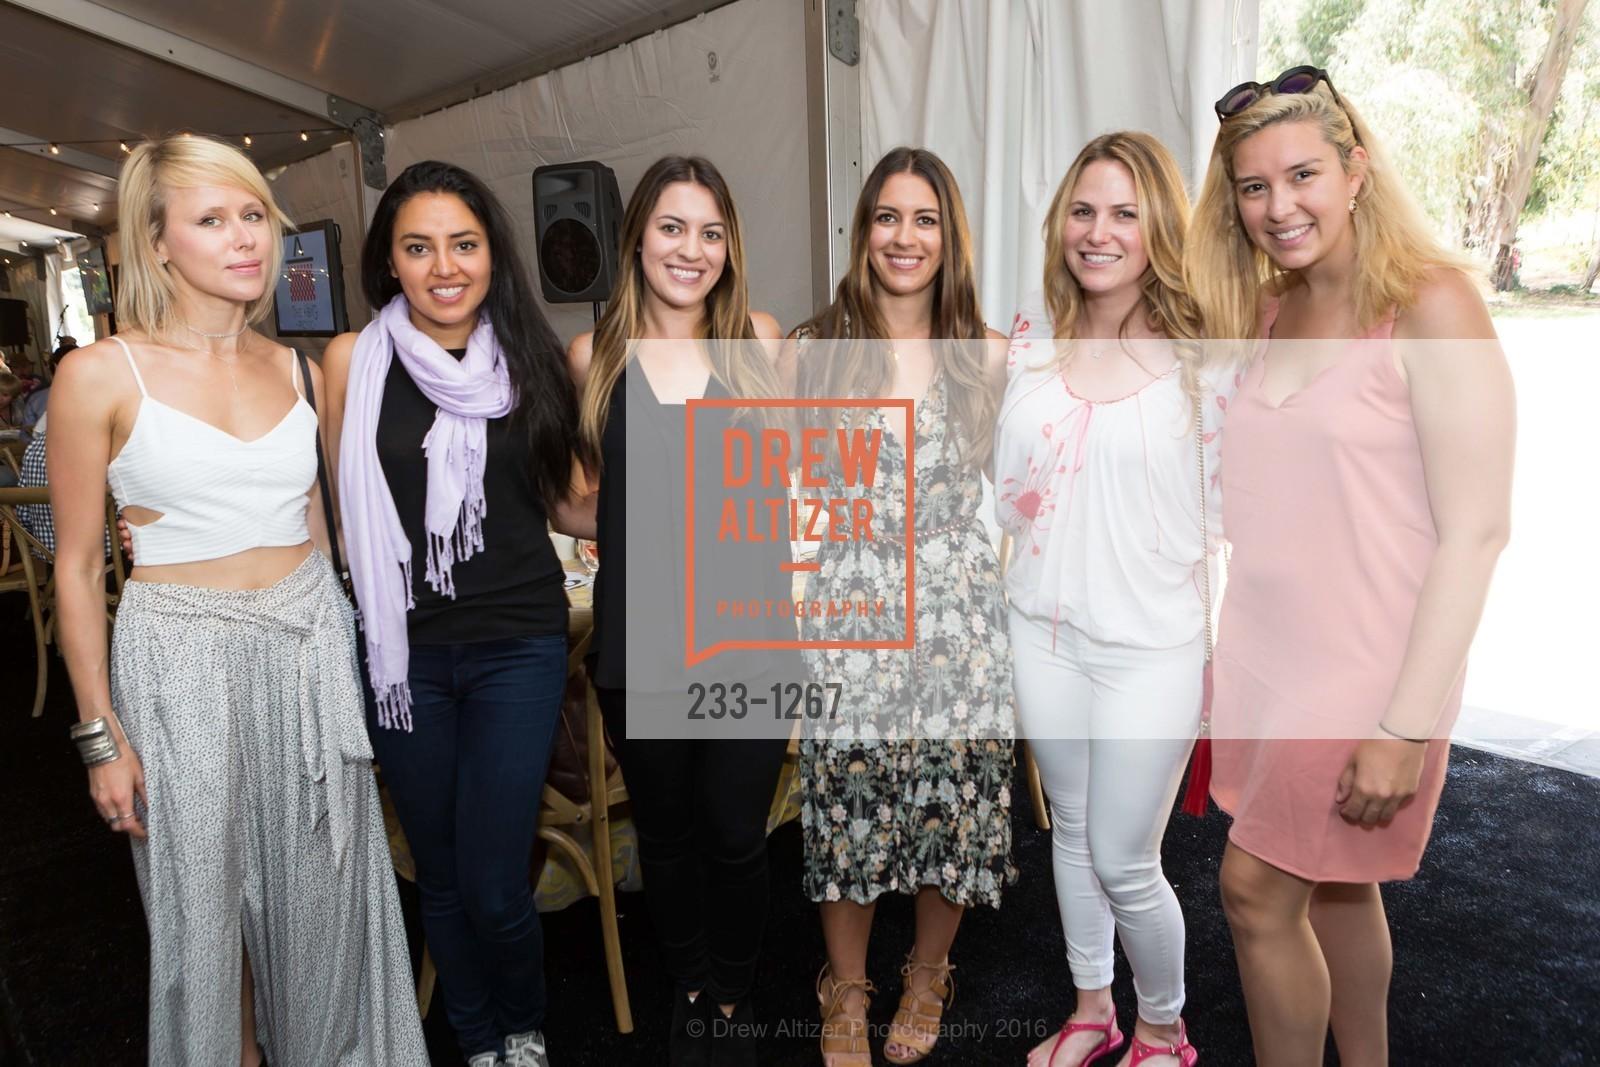 Daria Levko, Nilou Ghazizadeh, Natalie Mulay, Amanda Mulay, Jennifer Goldman, Daniella Segal, Photo #233-1267